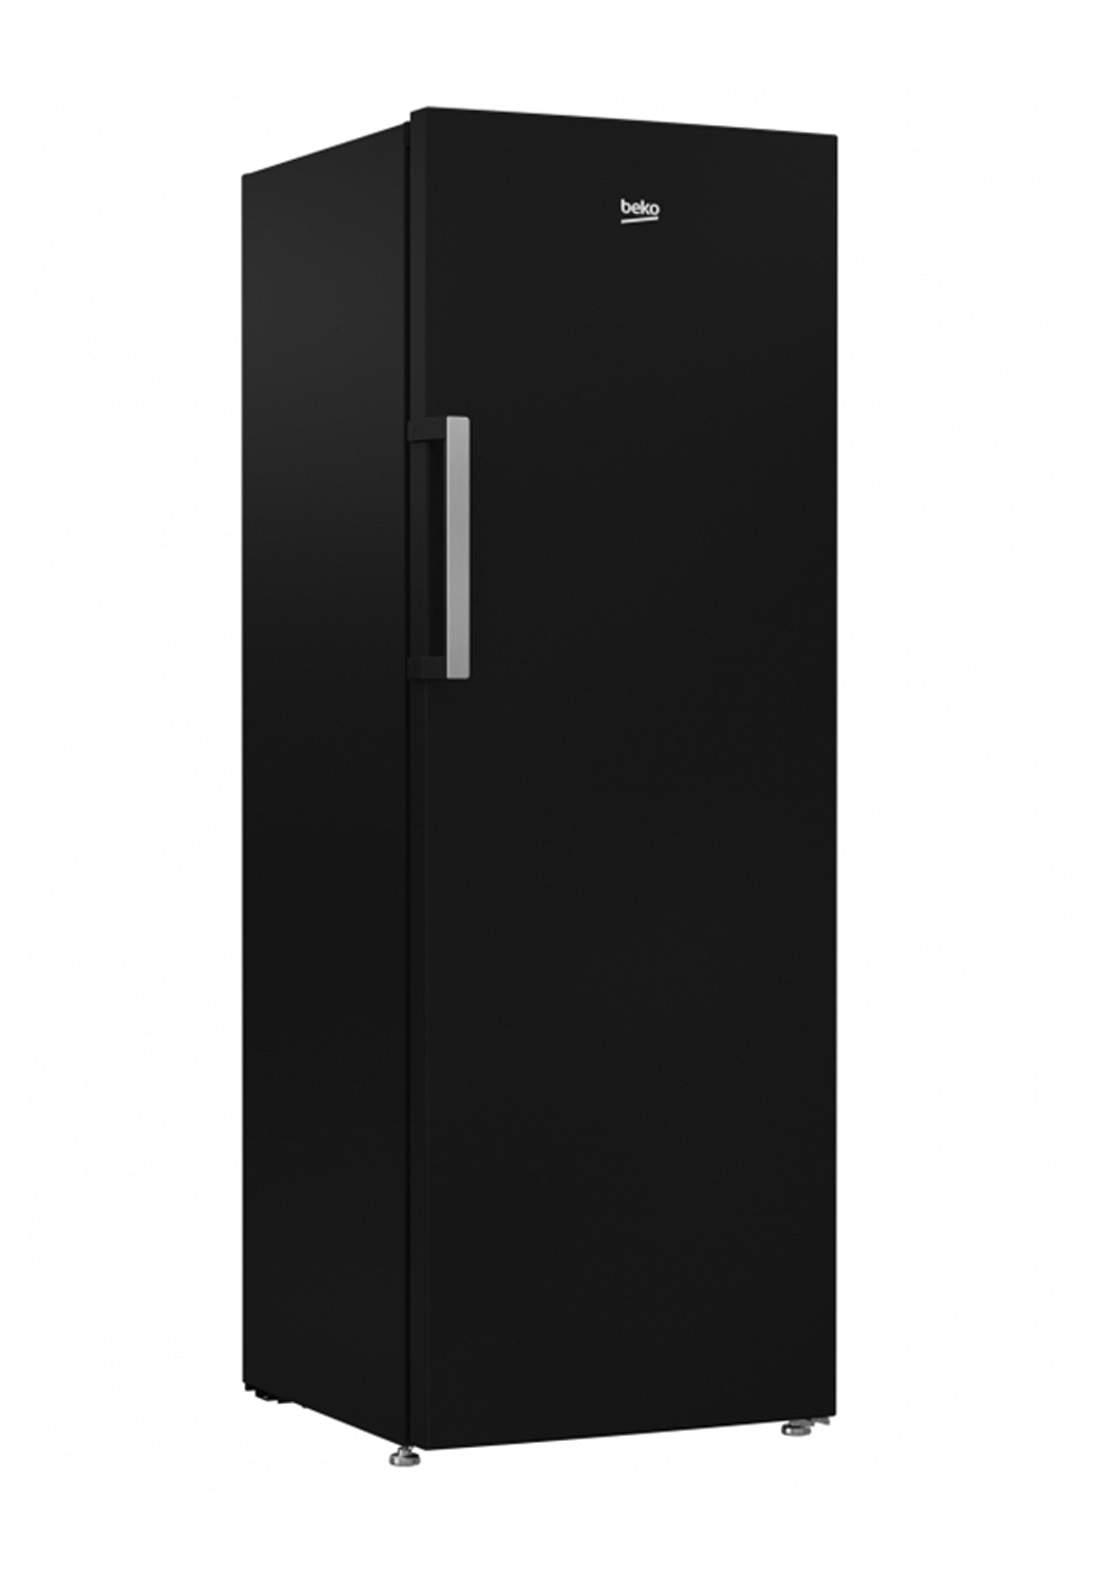 Beko FFP1671B Upright Freezer 11ft - Black